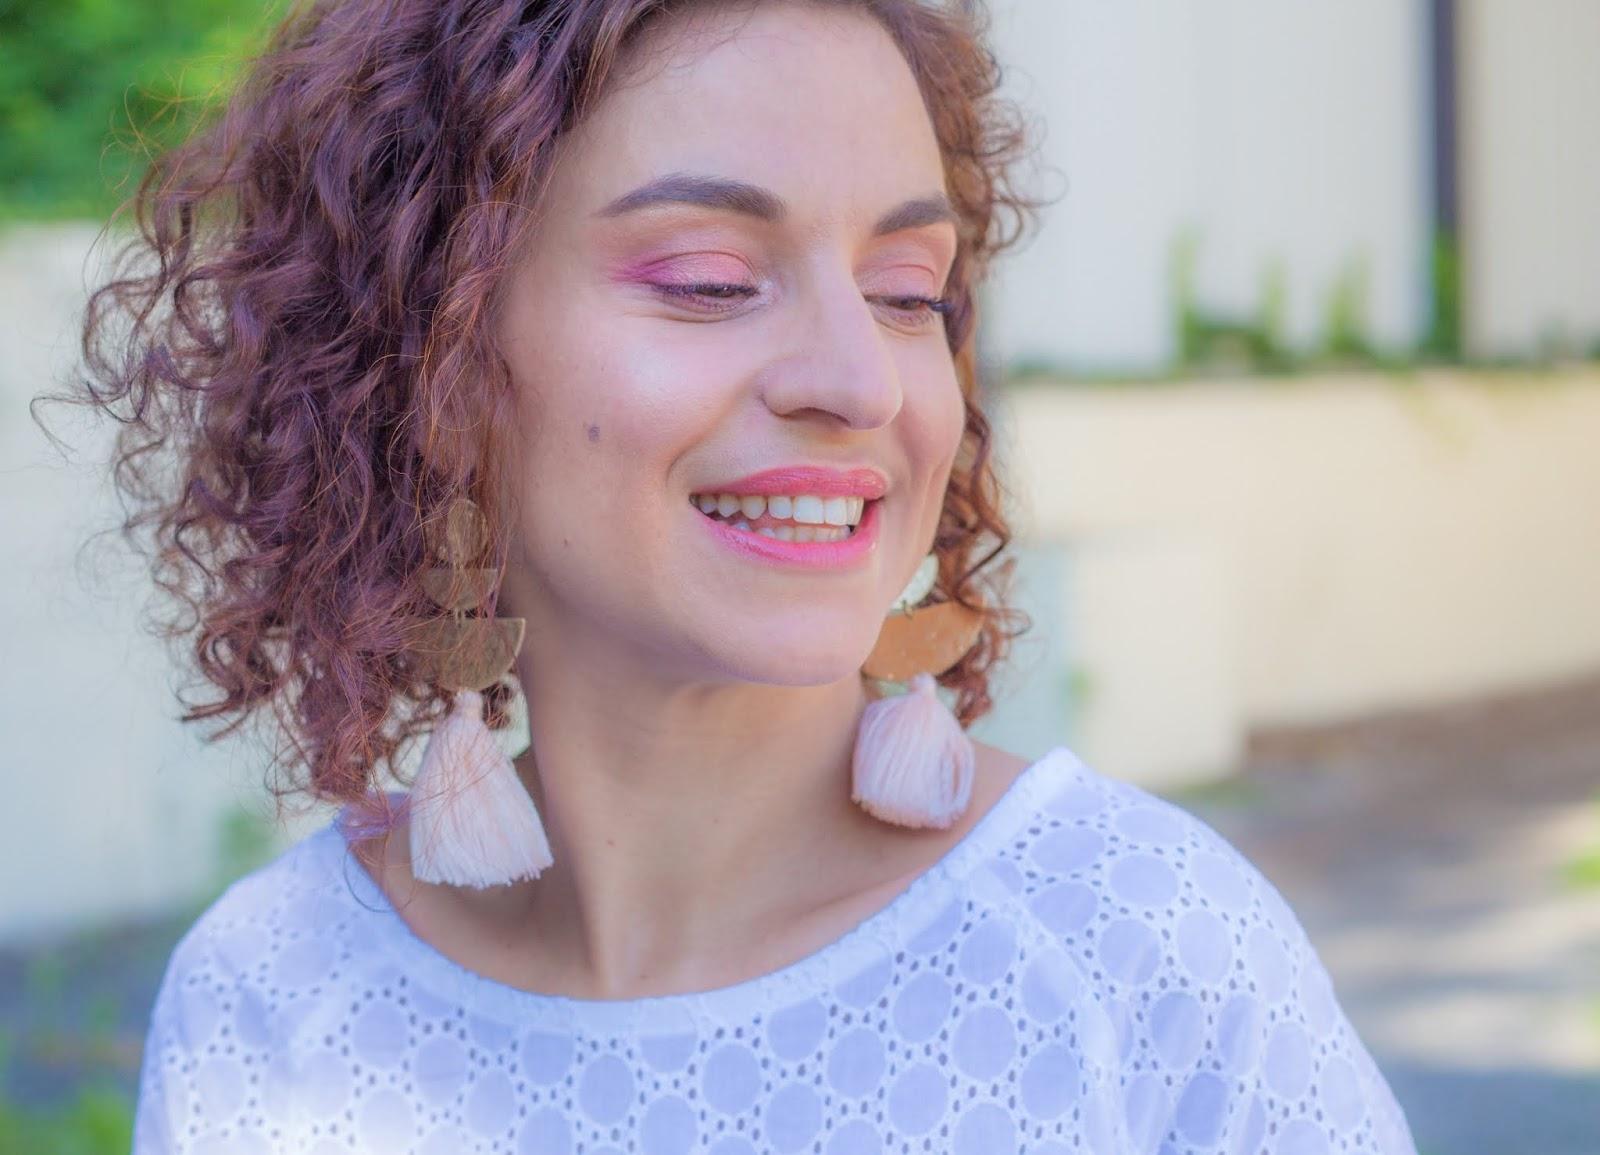 maquillage - estival - rose - corail